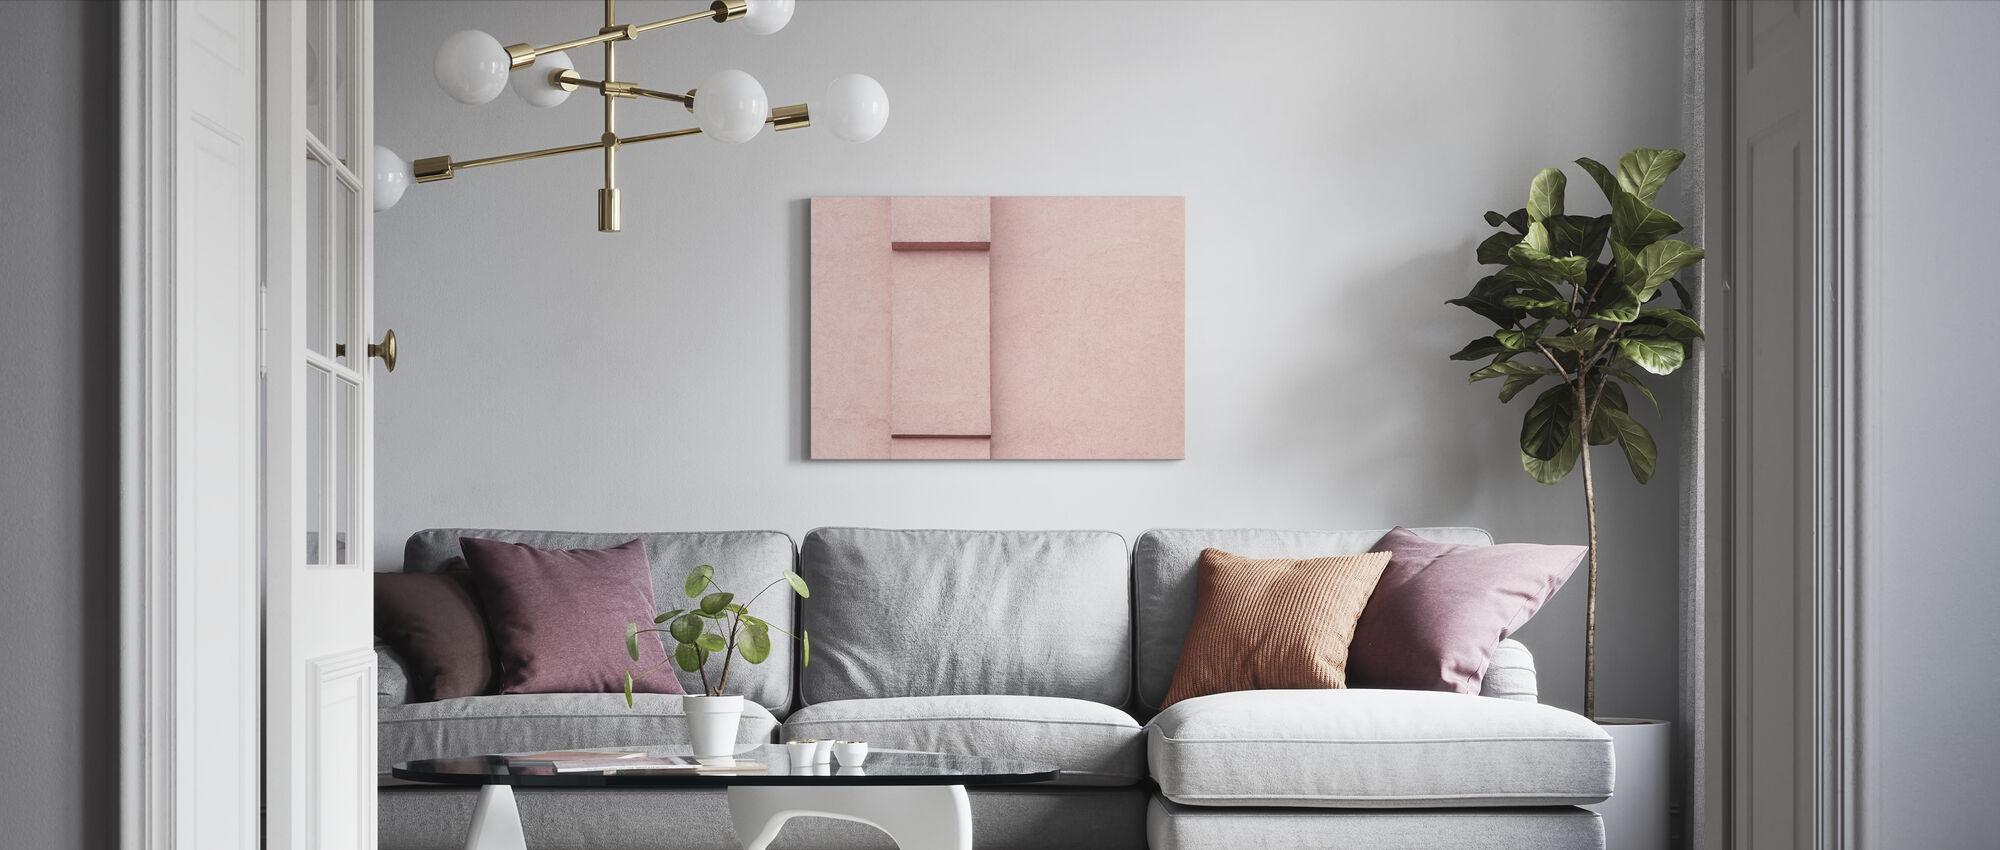 Vibrant Wall - Canvas print - Living Room